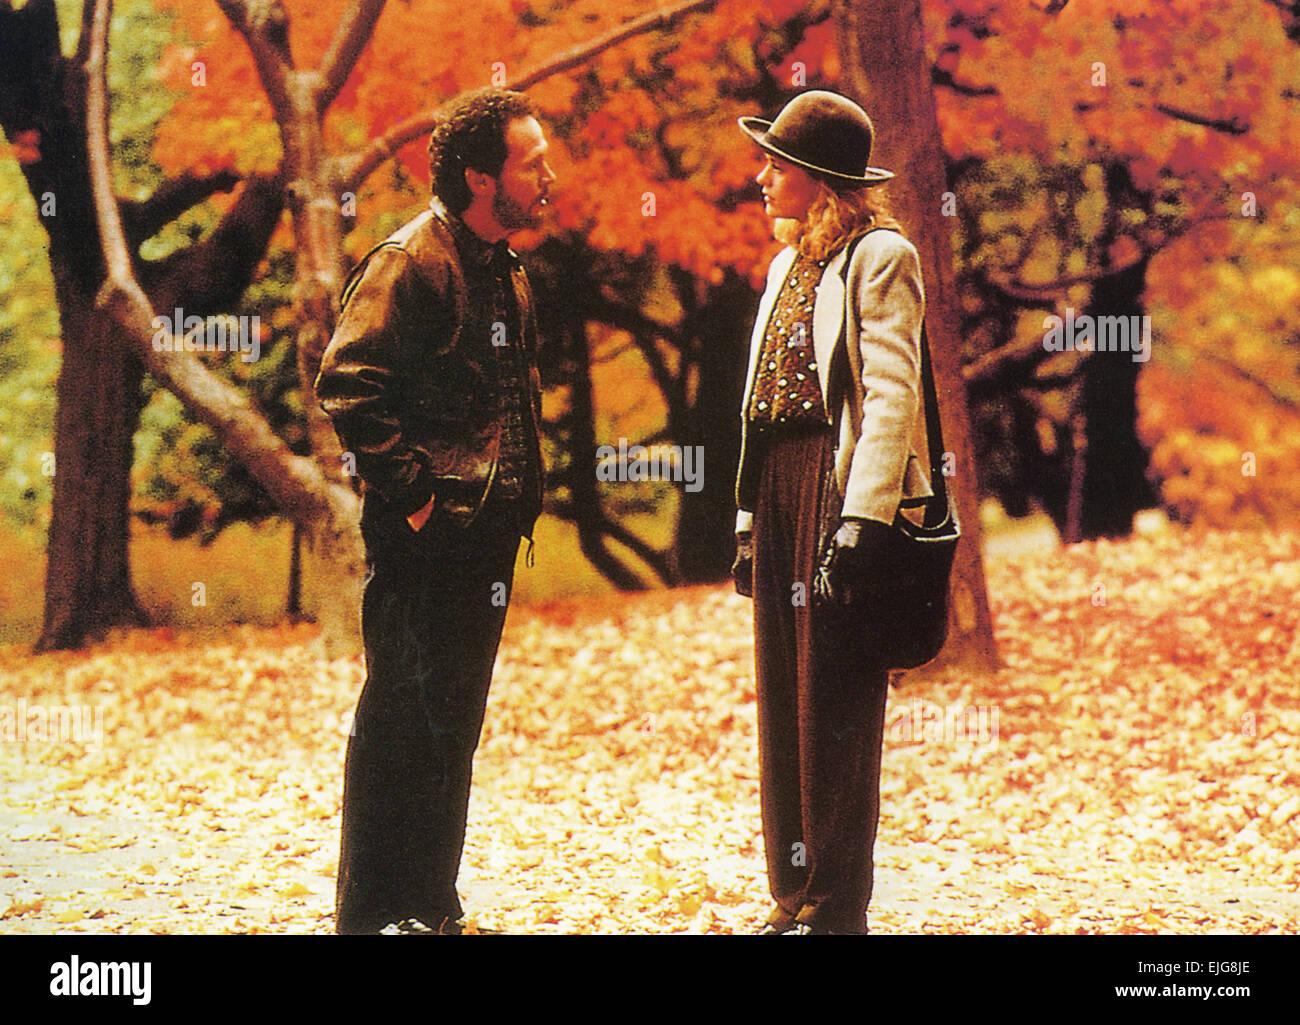 Wenn HARRY MET SALLY 1989 Castle Rock film mit Meg Ryan und Billy Crystal Stockbild